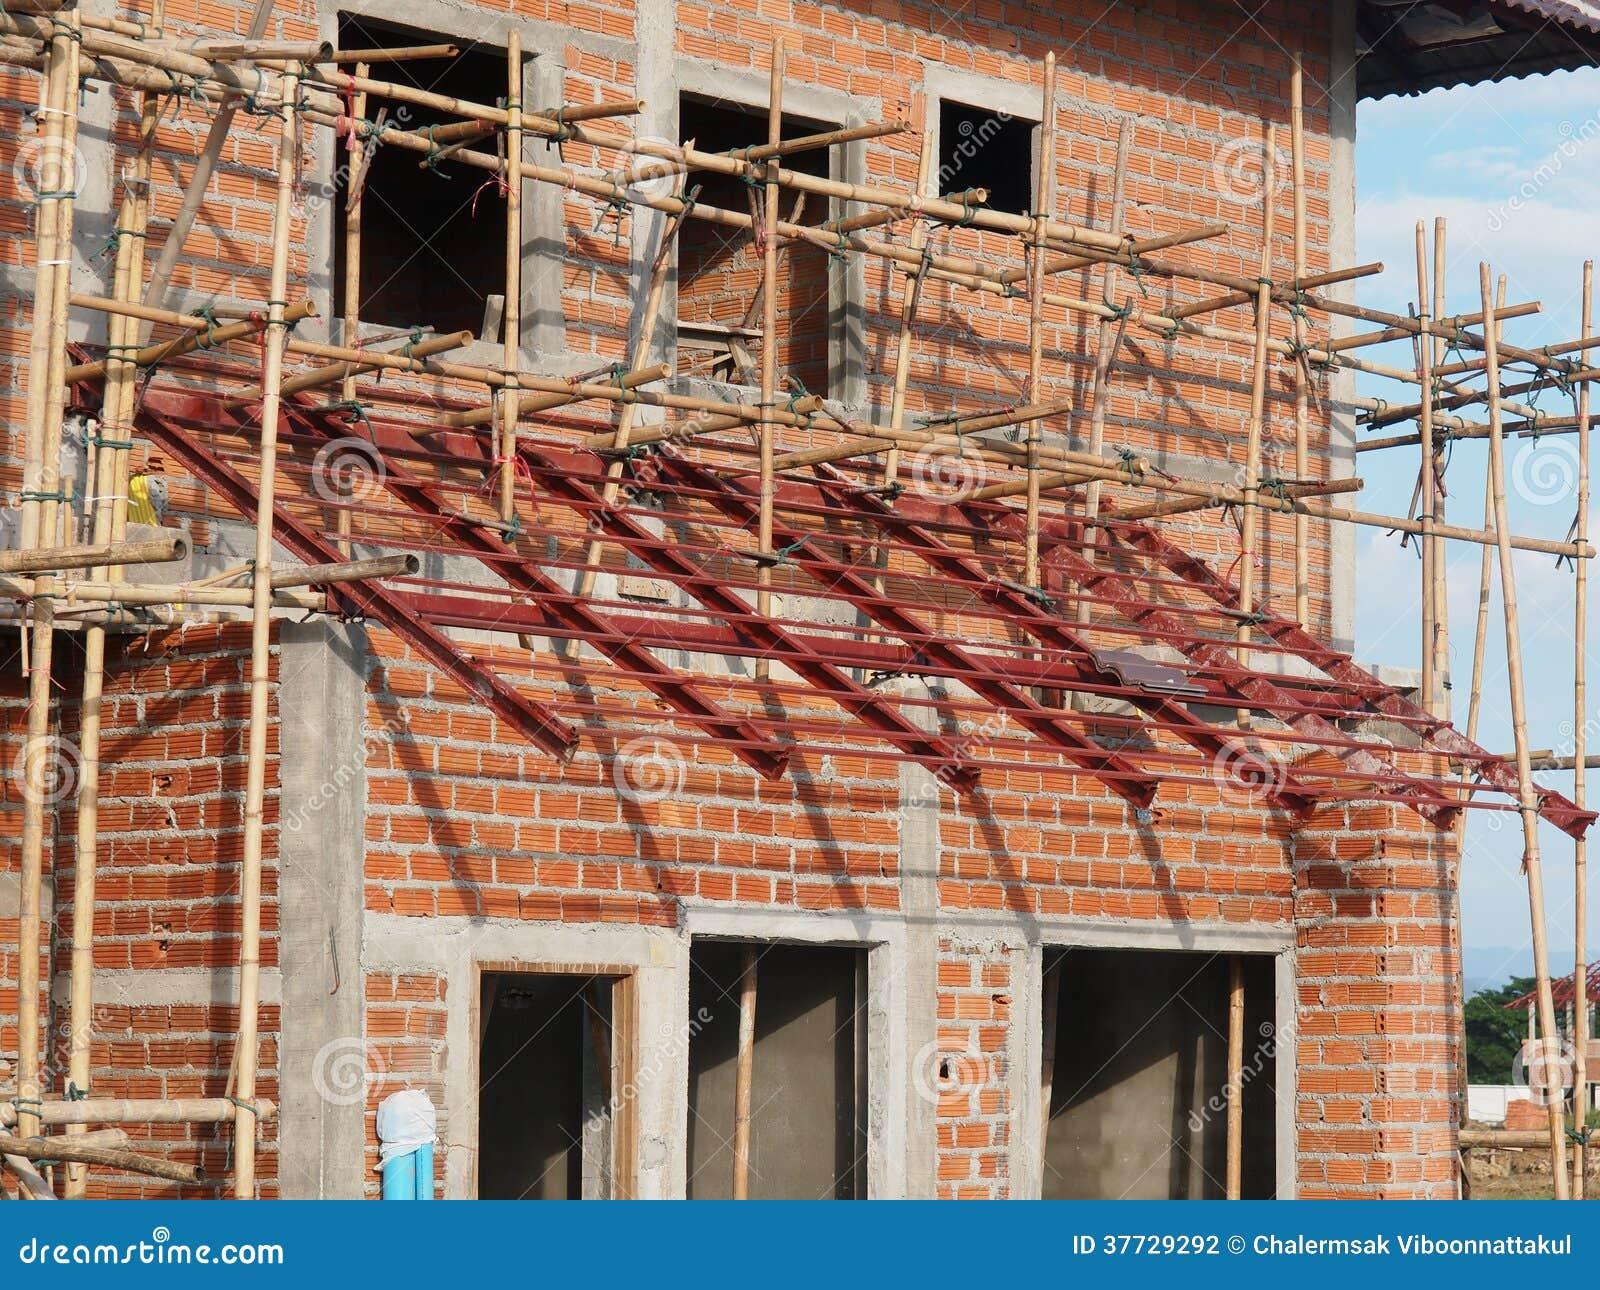 Brick house under construction stock photography image for Brick house construction